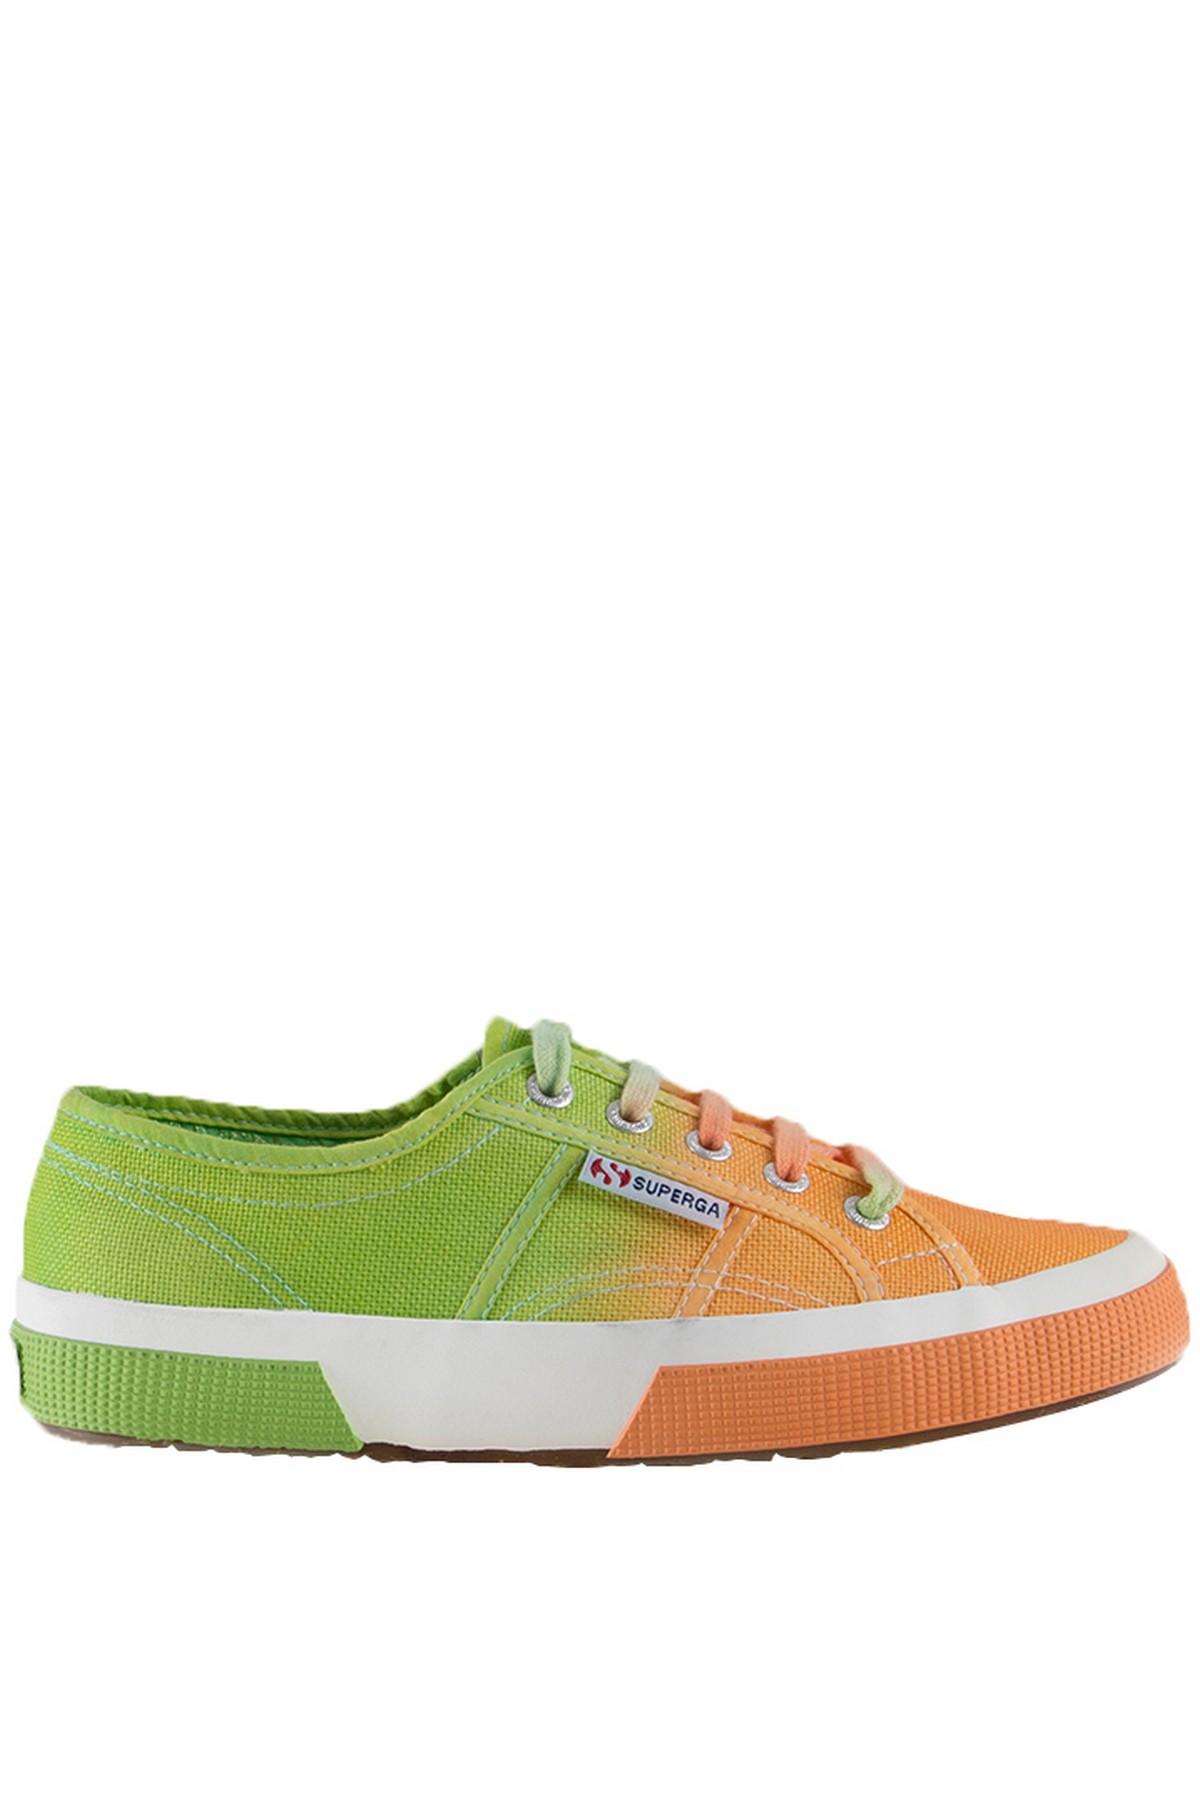 Superga Kadın Ayakkabı 2750 - Cotu Classic Turuncu-Yeşil Renk (S0032F0-929)